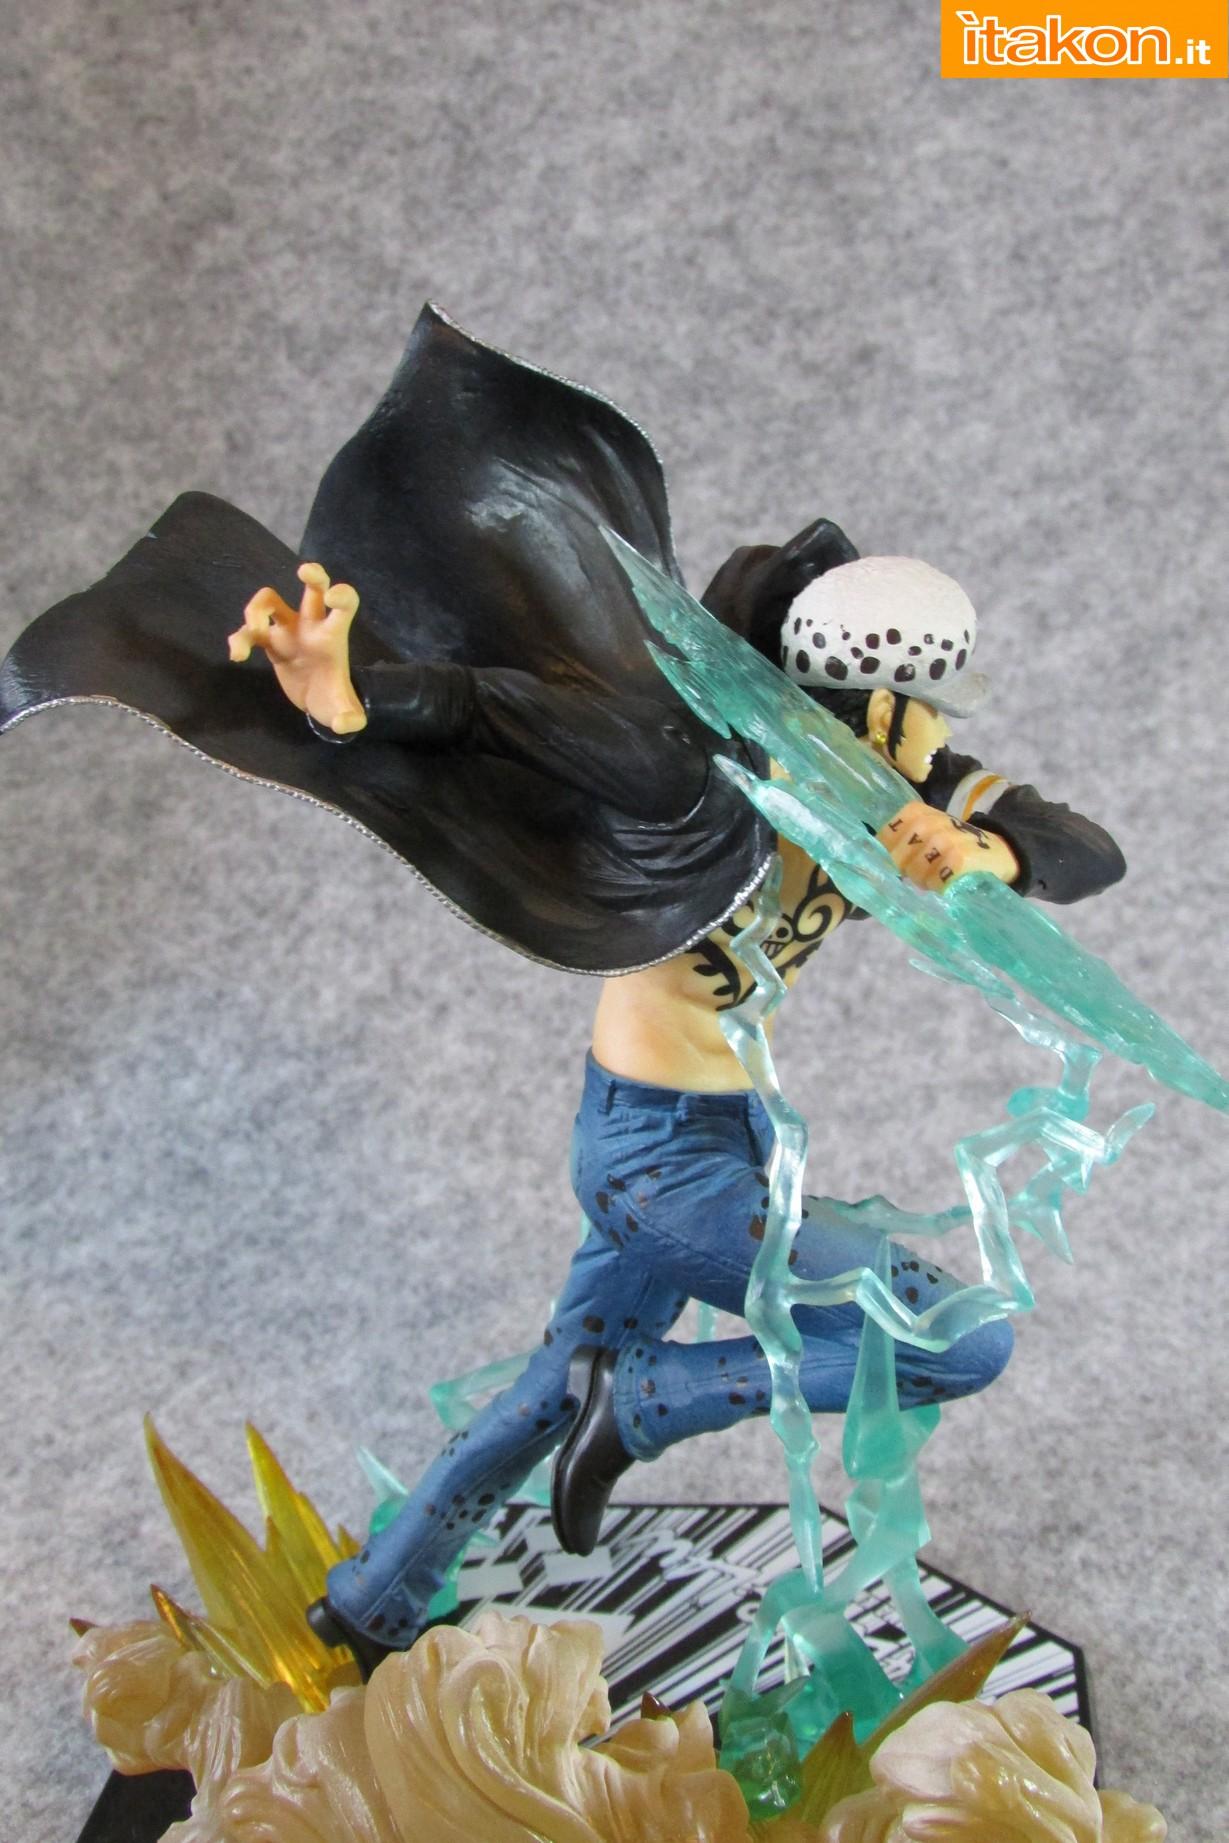 Link a One Piece Trafalgar Law Gamma Knife Figuarts ZERO Chou Gekisen Extra Battle Recensione Review Itakon.it 20